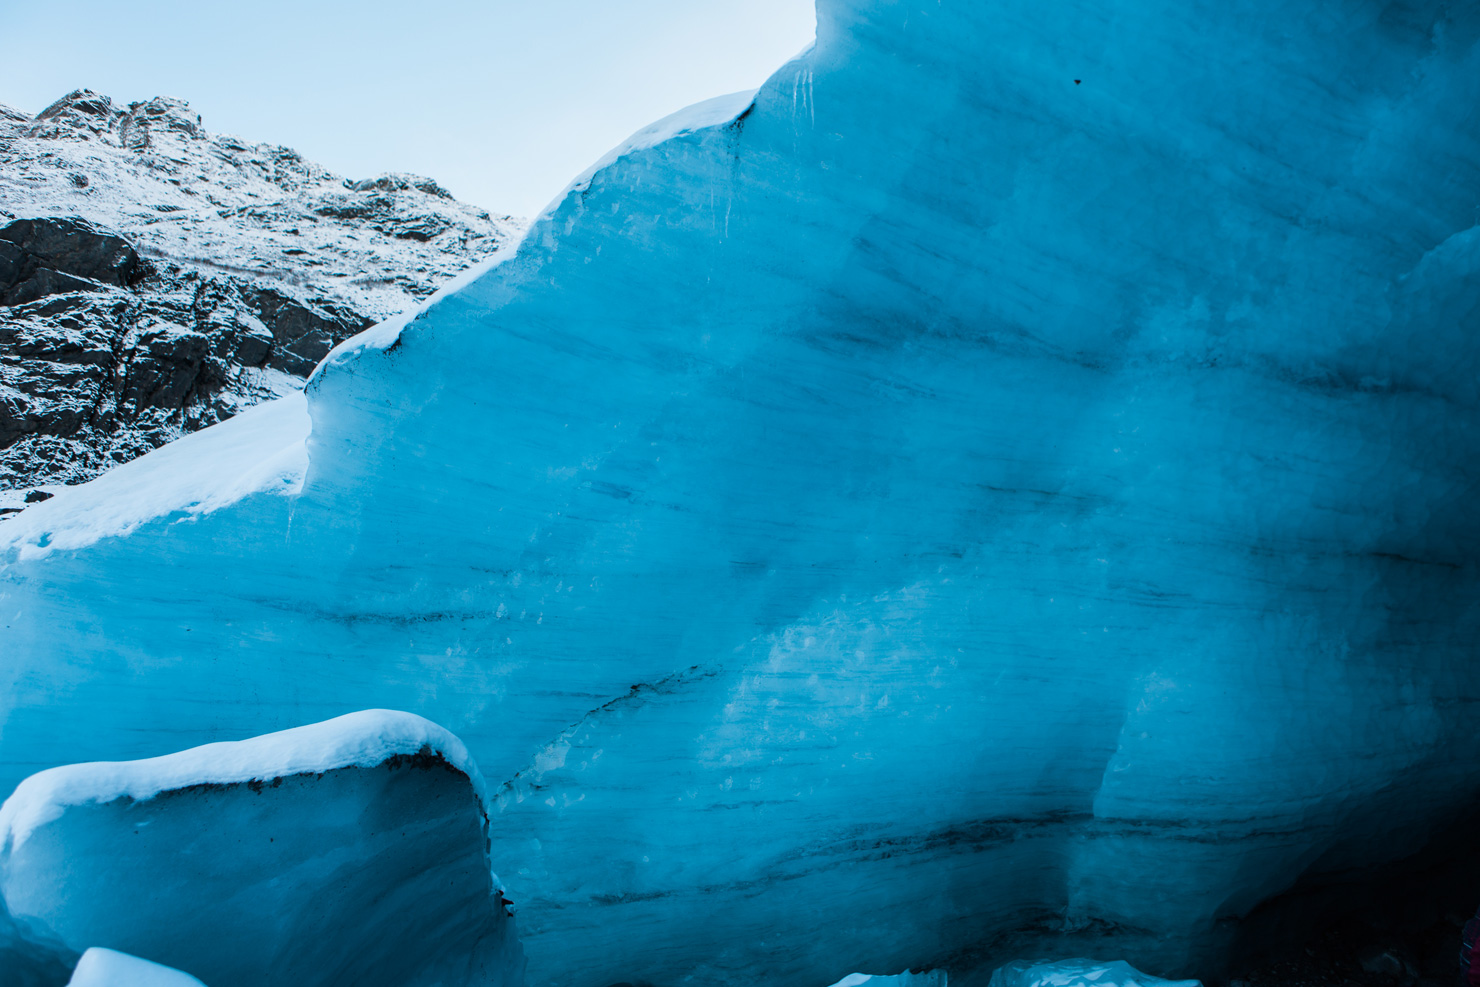 CindyGiovagnoli_hiking_glacier_Anchorage_snow_winter_ByronGlacier_Alaska-028.jpg